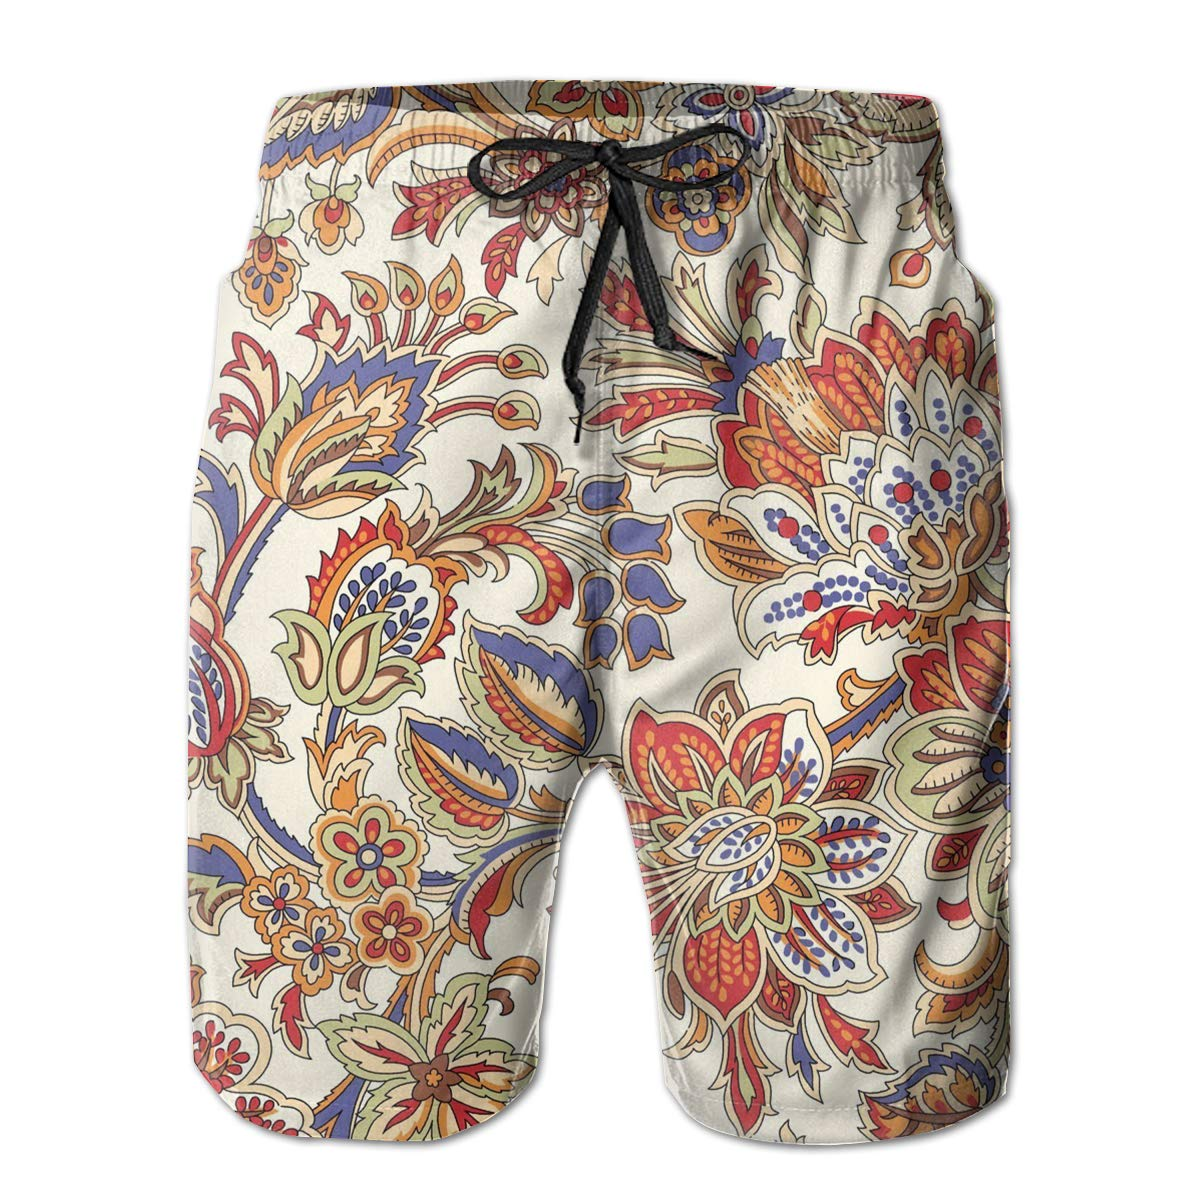 JIA LI Mens Board Shorts Paisley Summer Printed Quick-Dry Swim Trunks Beach Shorts